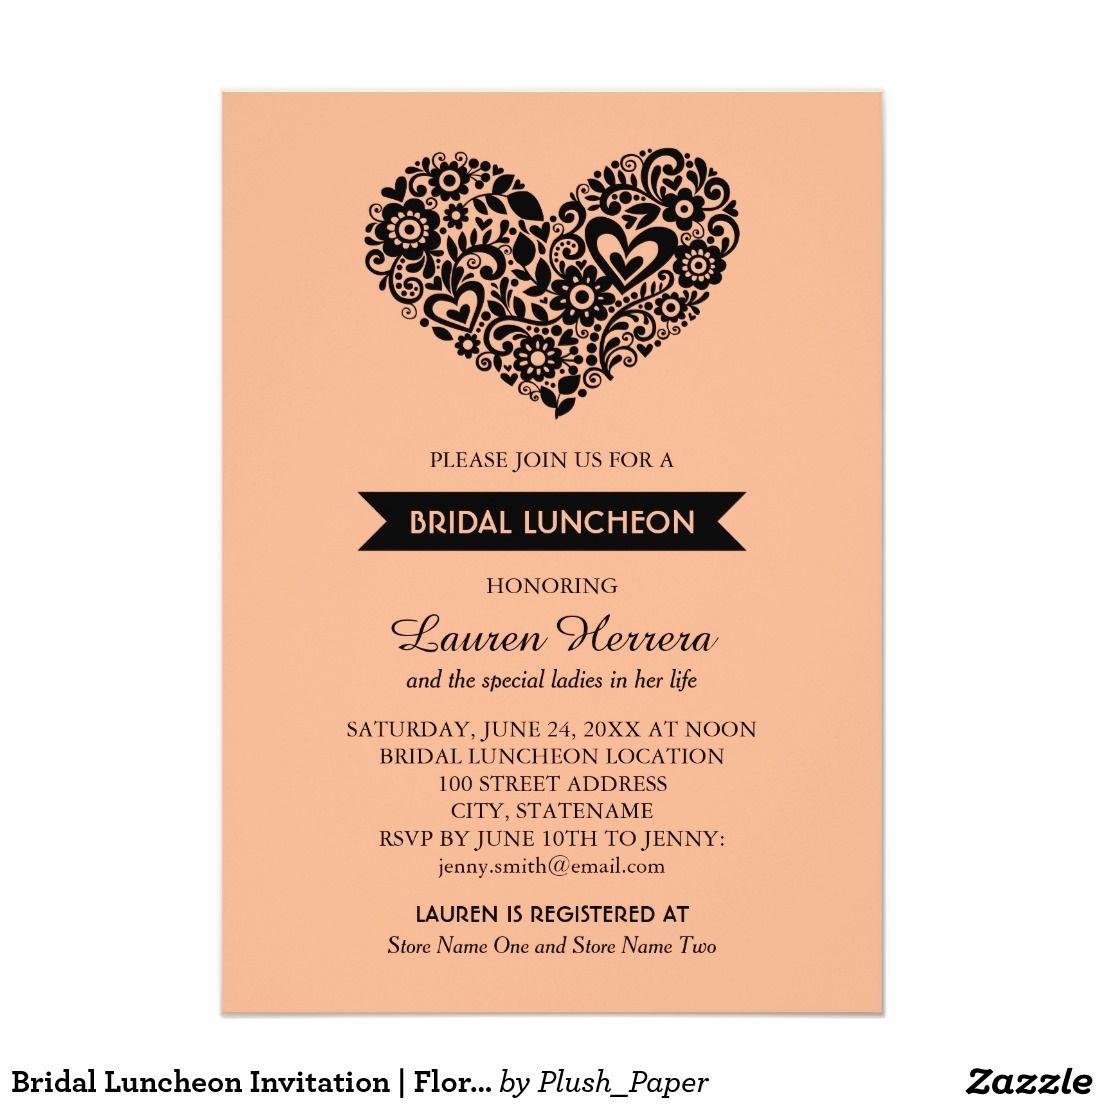 Bridal Luncheon Invitation | Floral Heart Design | WEDDING: BRIDAL ...